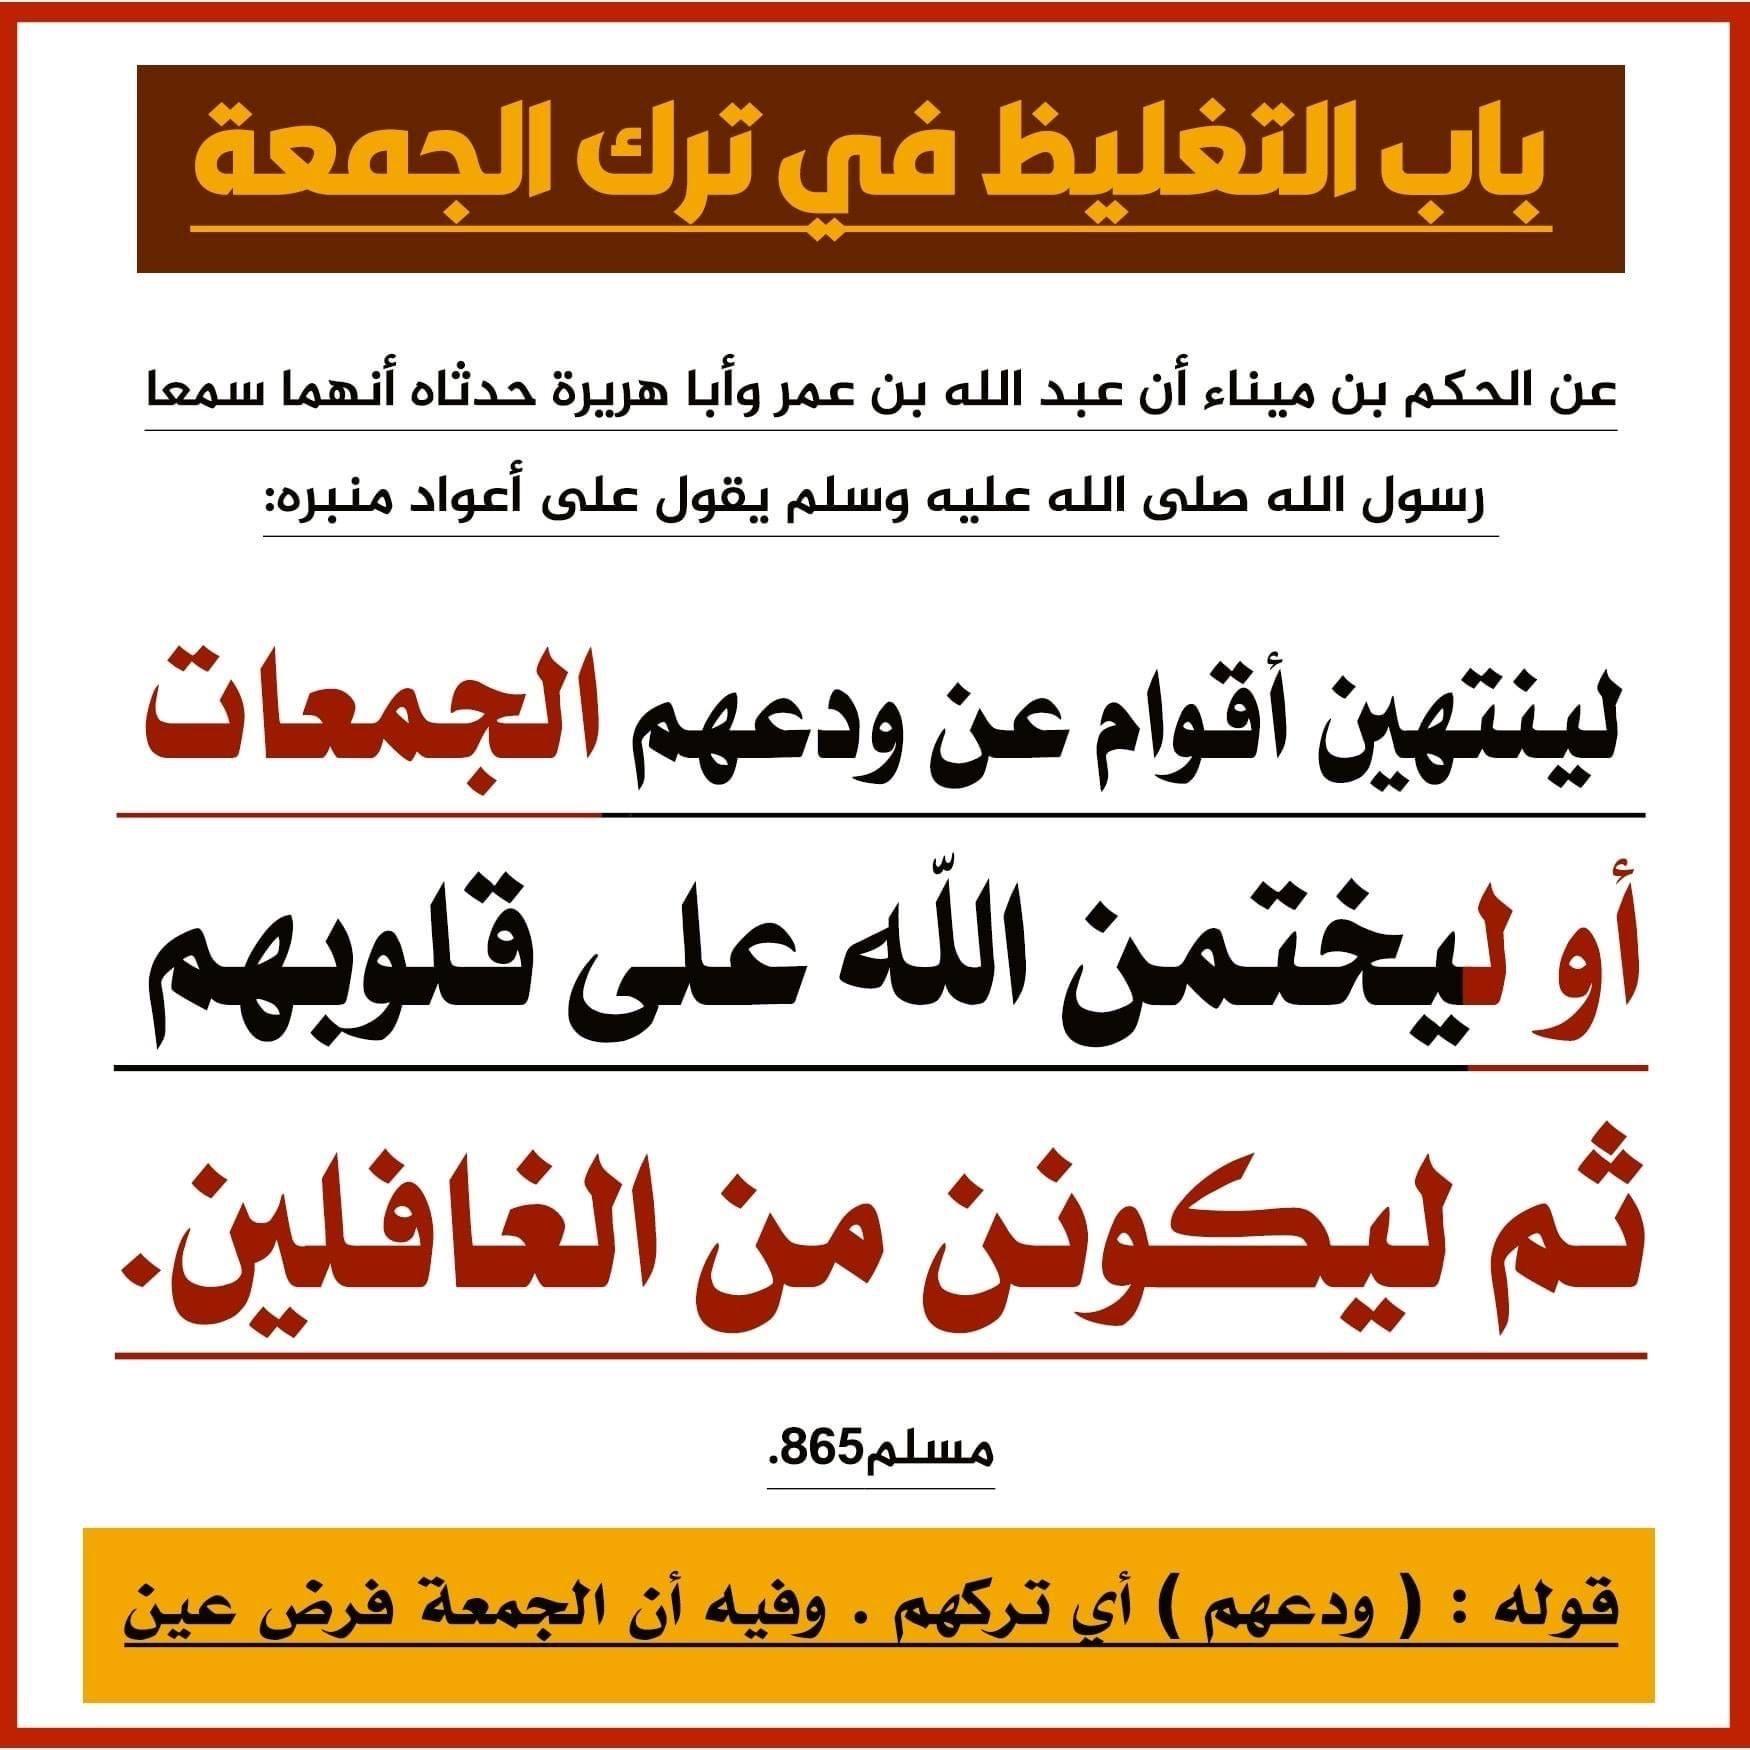 Pin By Reem On أحاديث نبوية Islam Facts Hadith Sharif Islam